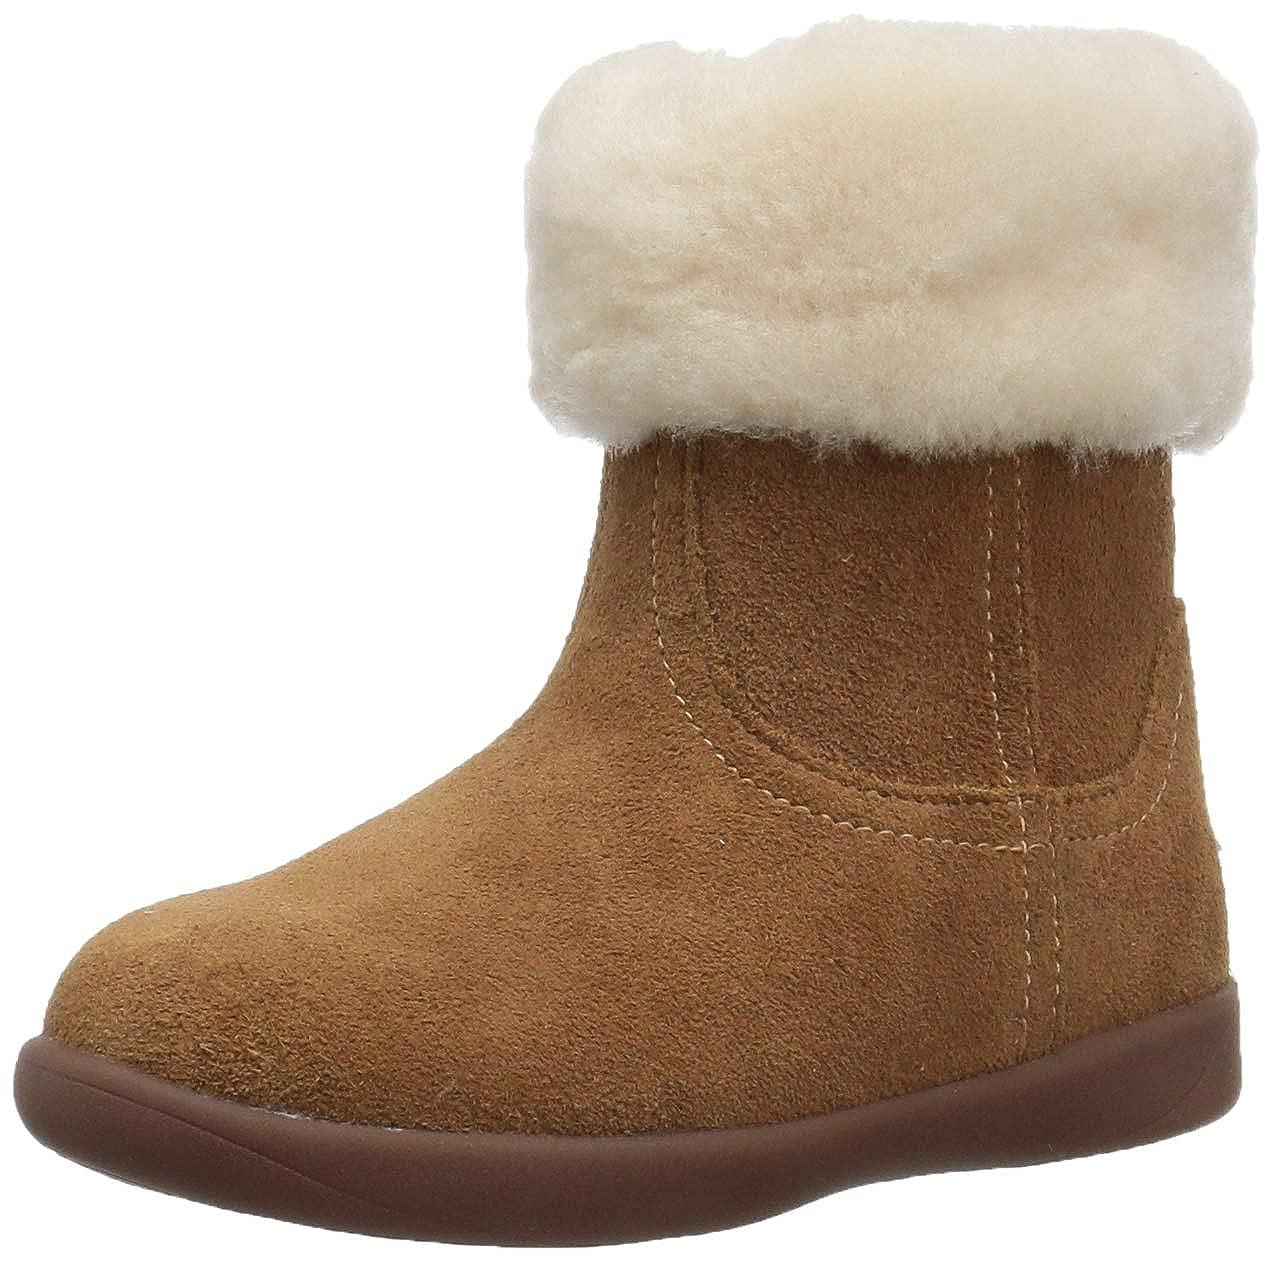 8f2b3e55544 UGG - Jorie 2 - Black - Kids Boots: Amazon.co.uk: Shoes & Bags